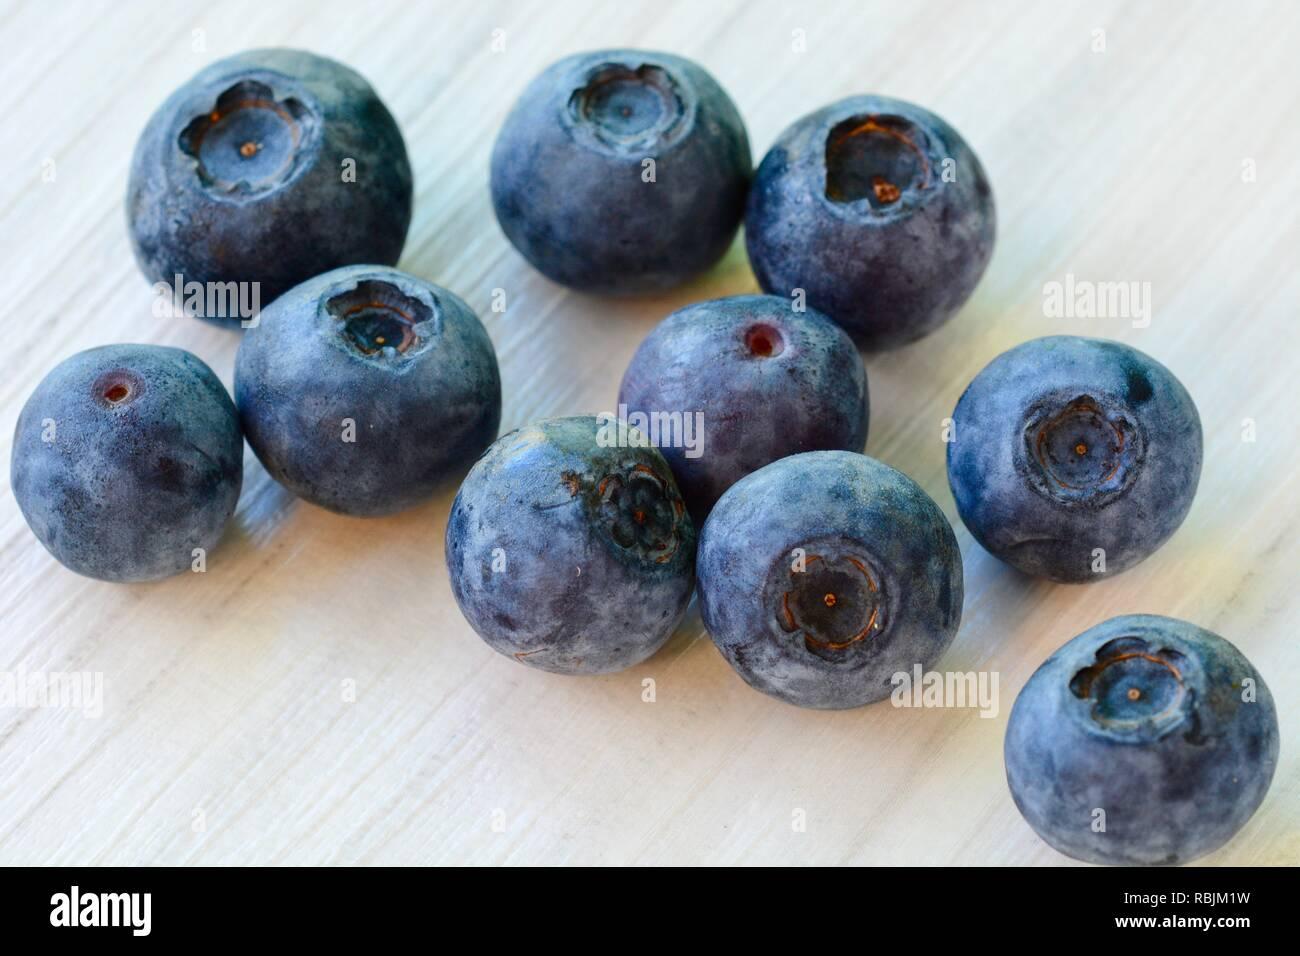 Close-up photo of fresh ripe blueberries on white wooden background - Stock Image